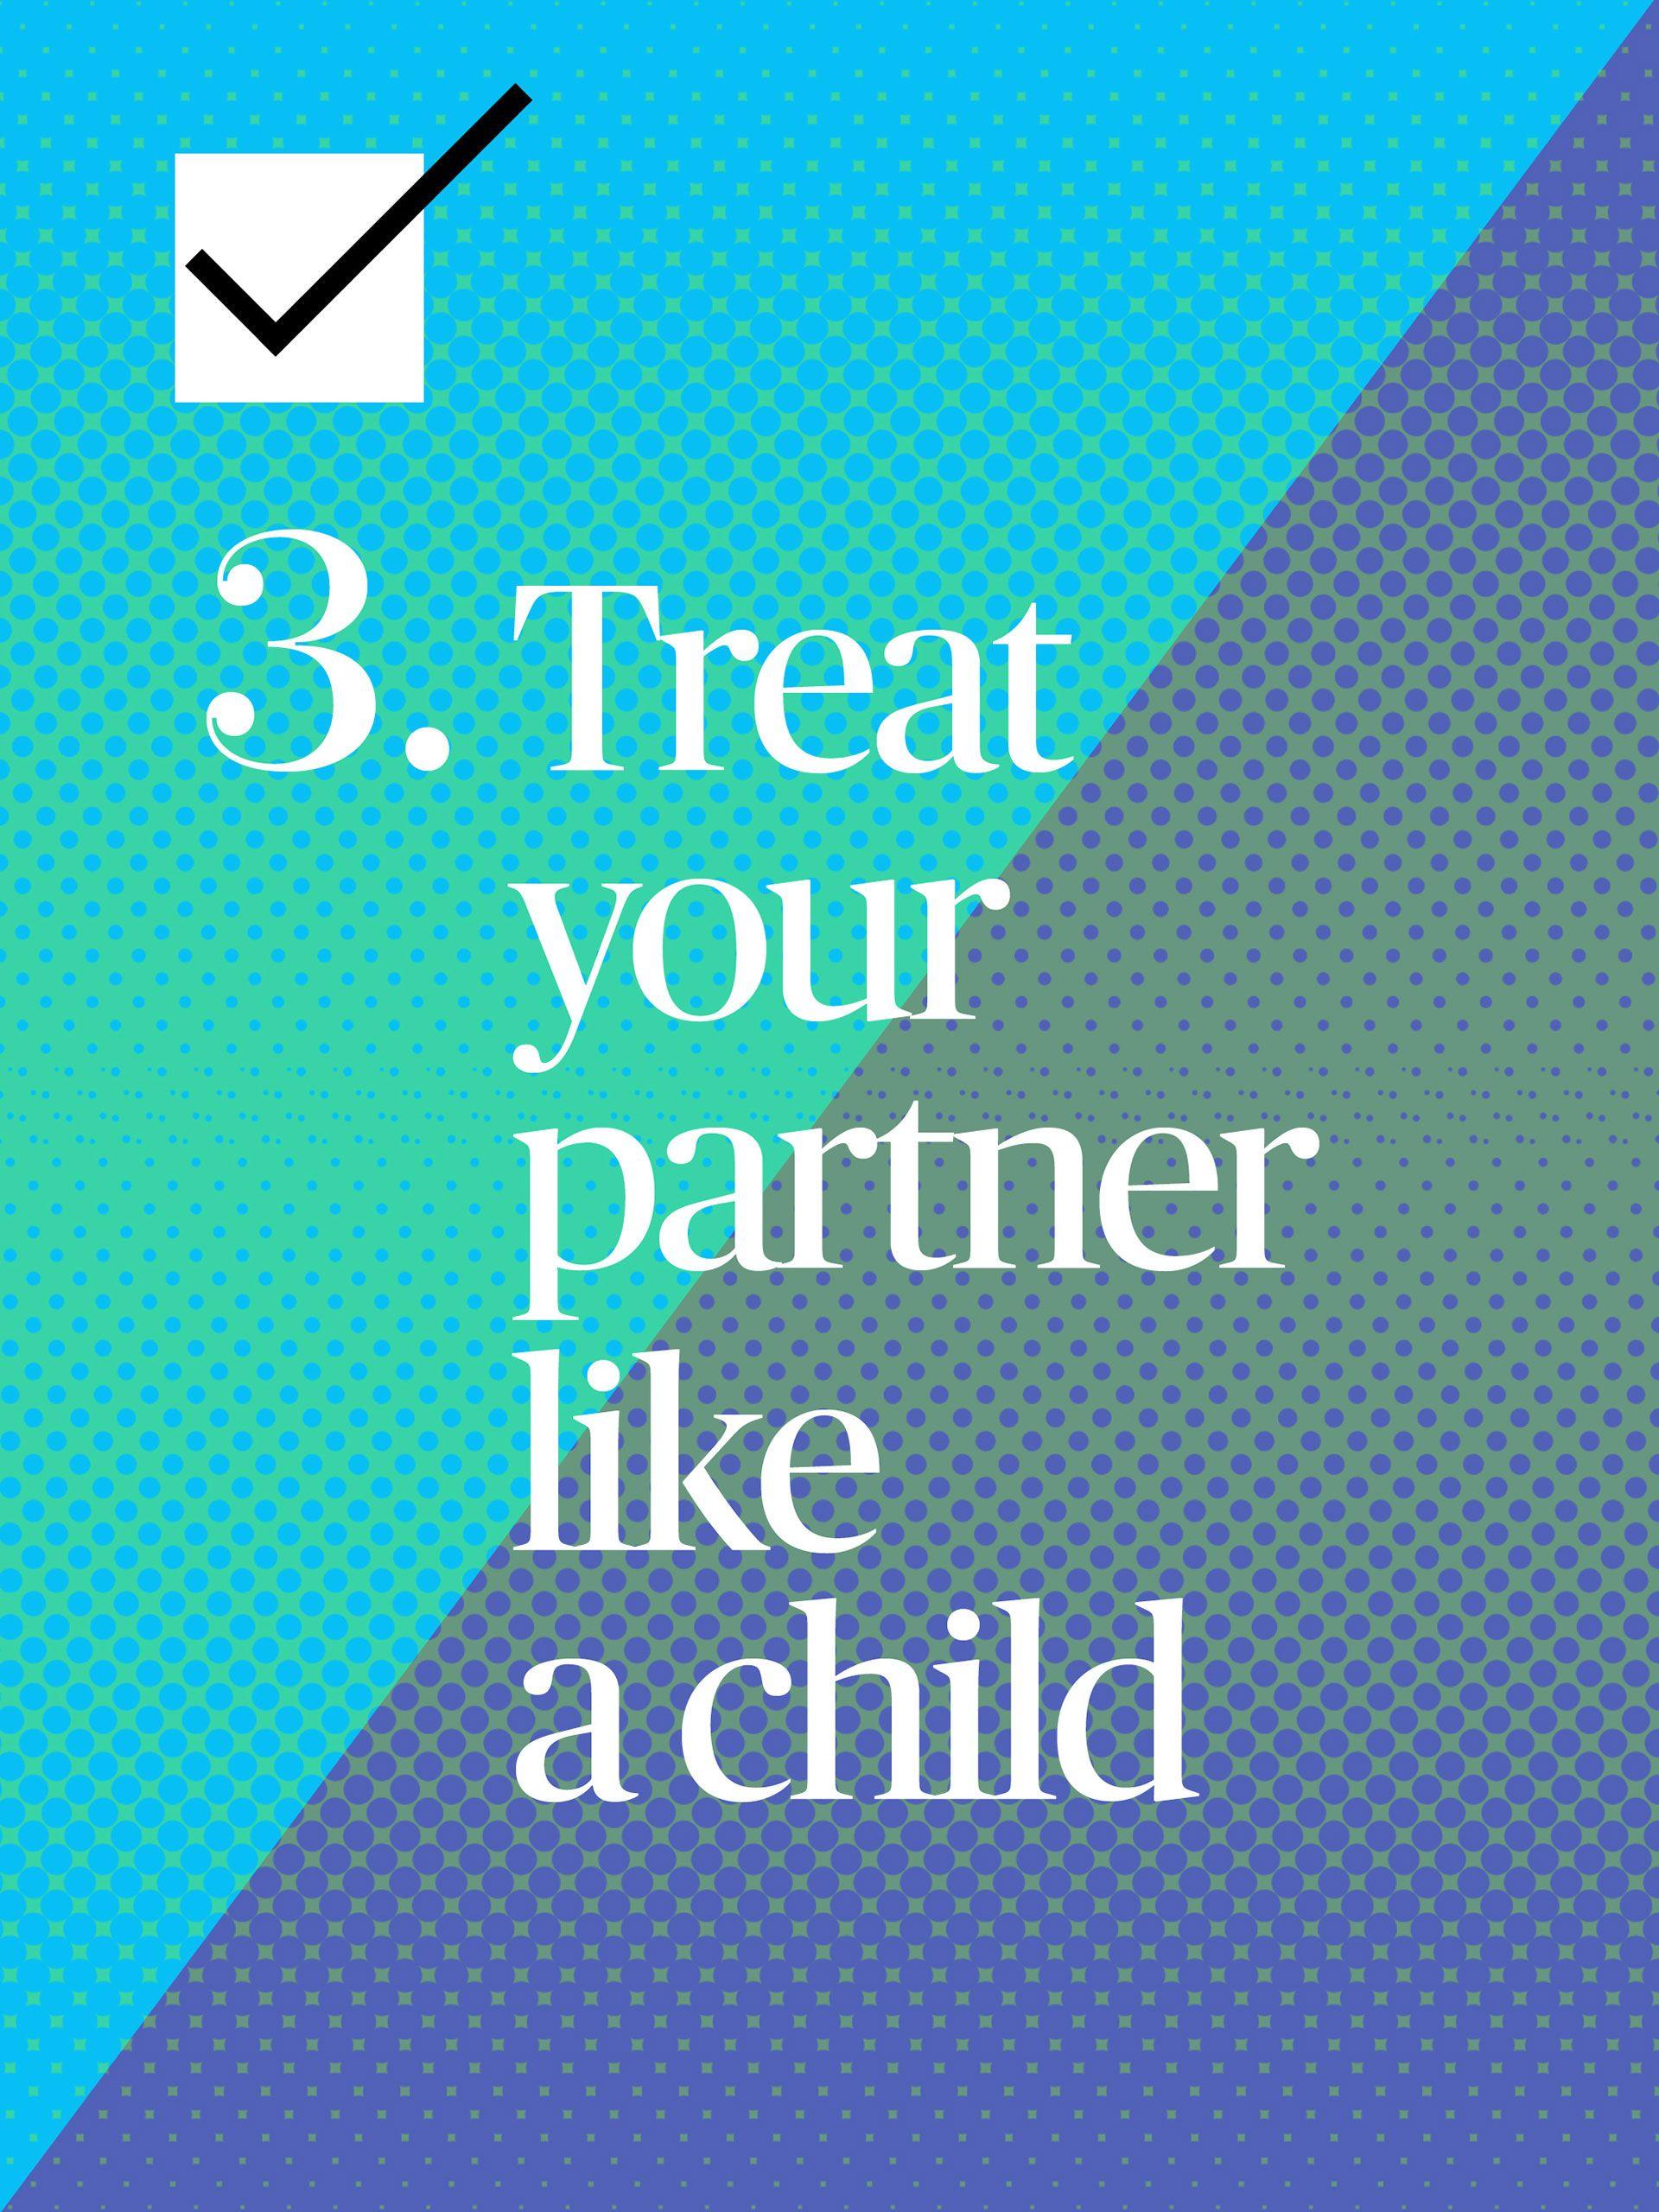 3 Simple Secrets For A Happier Marriage